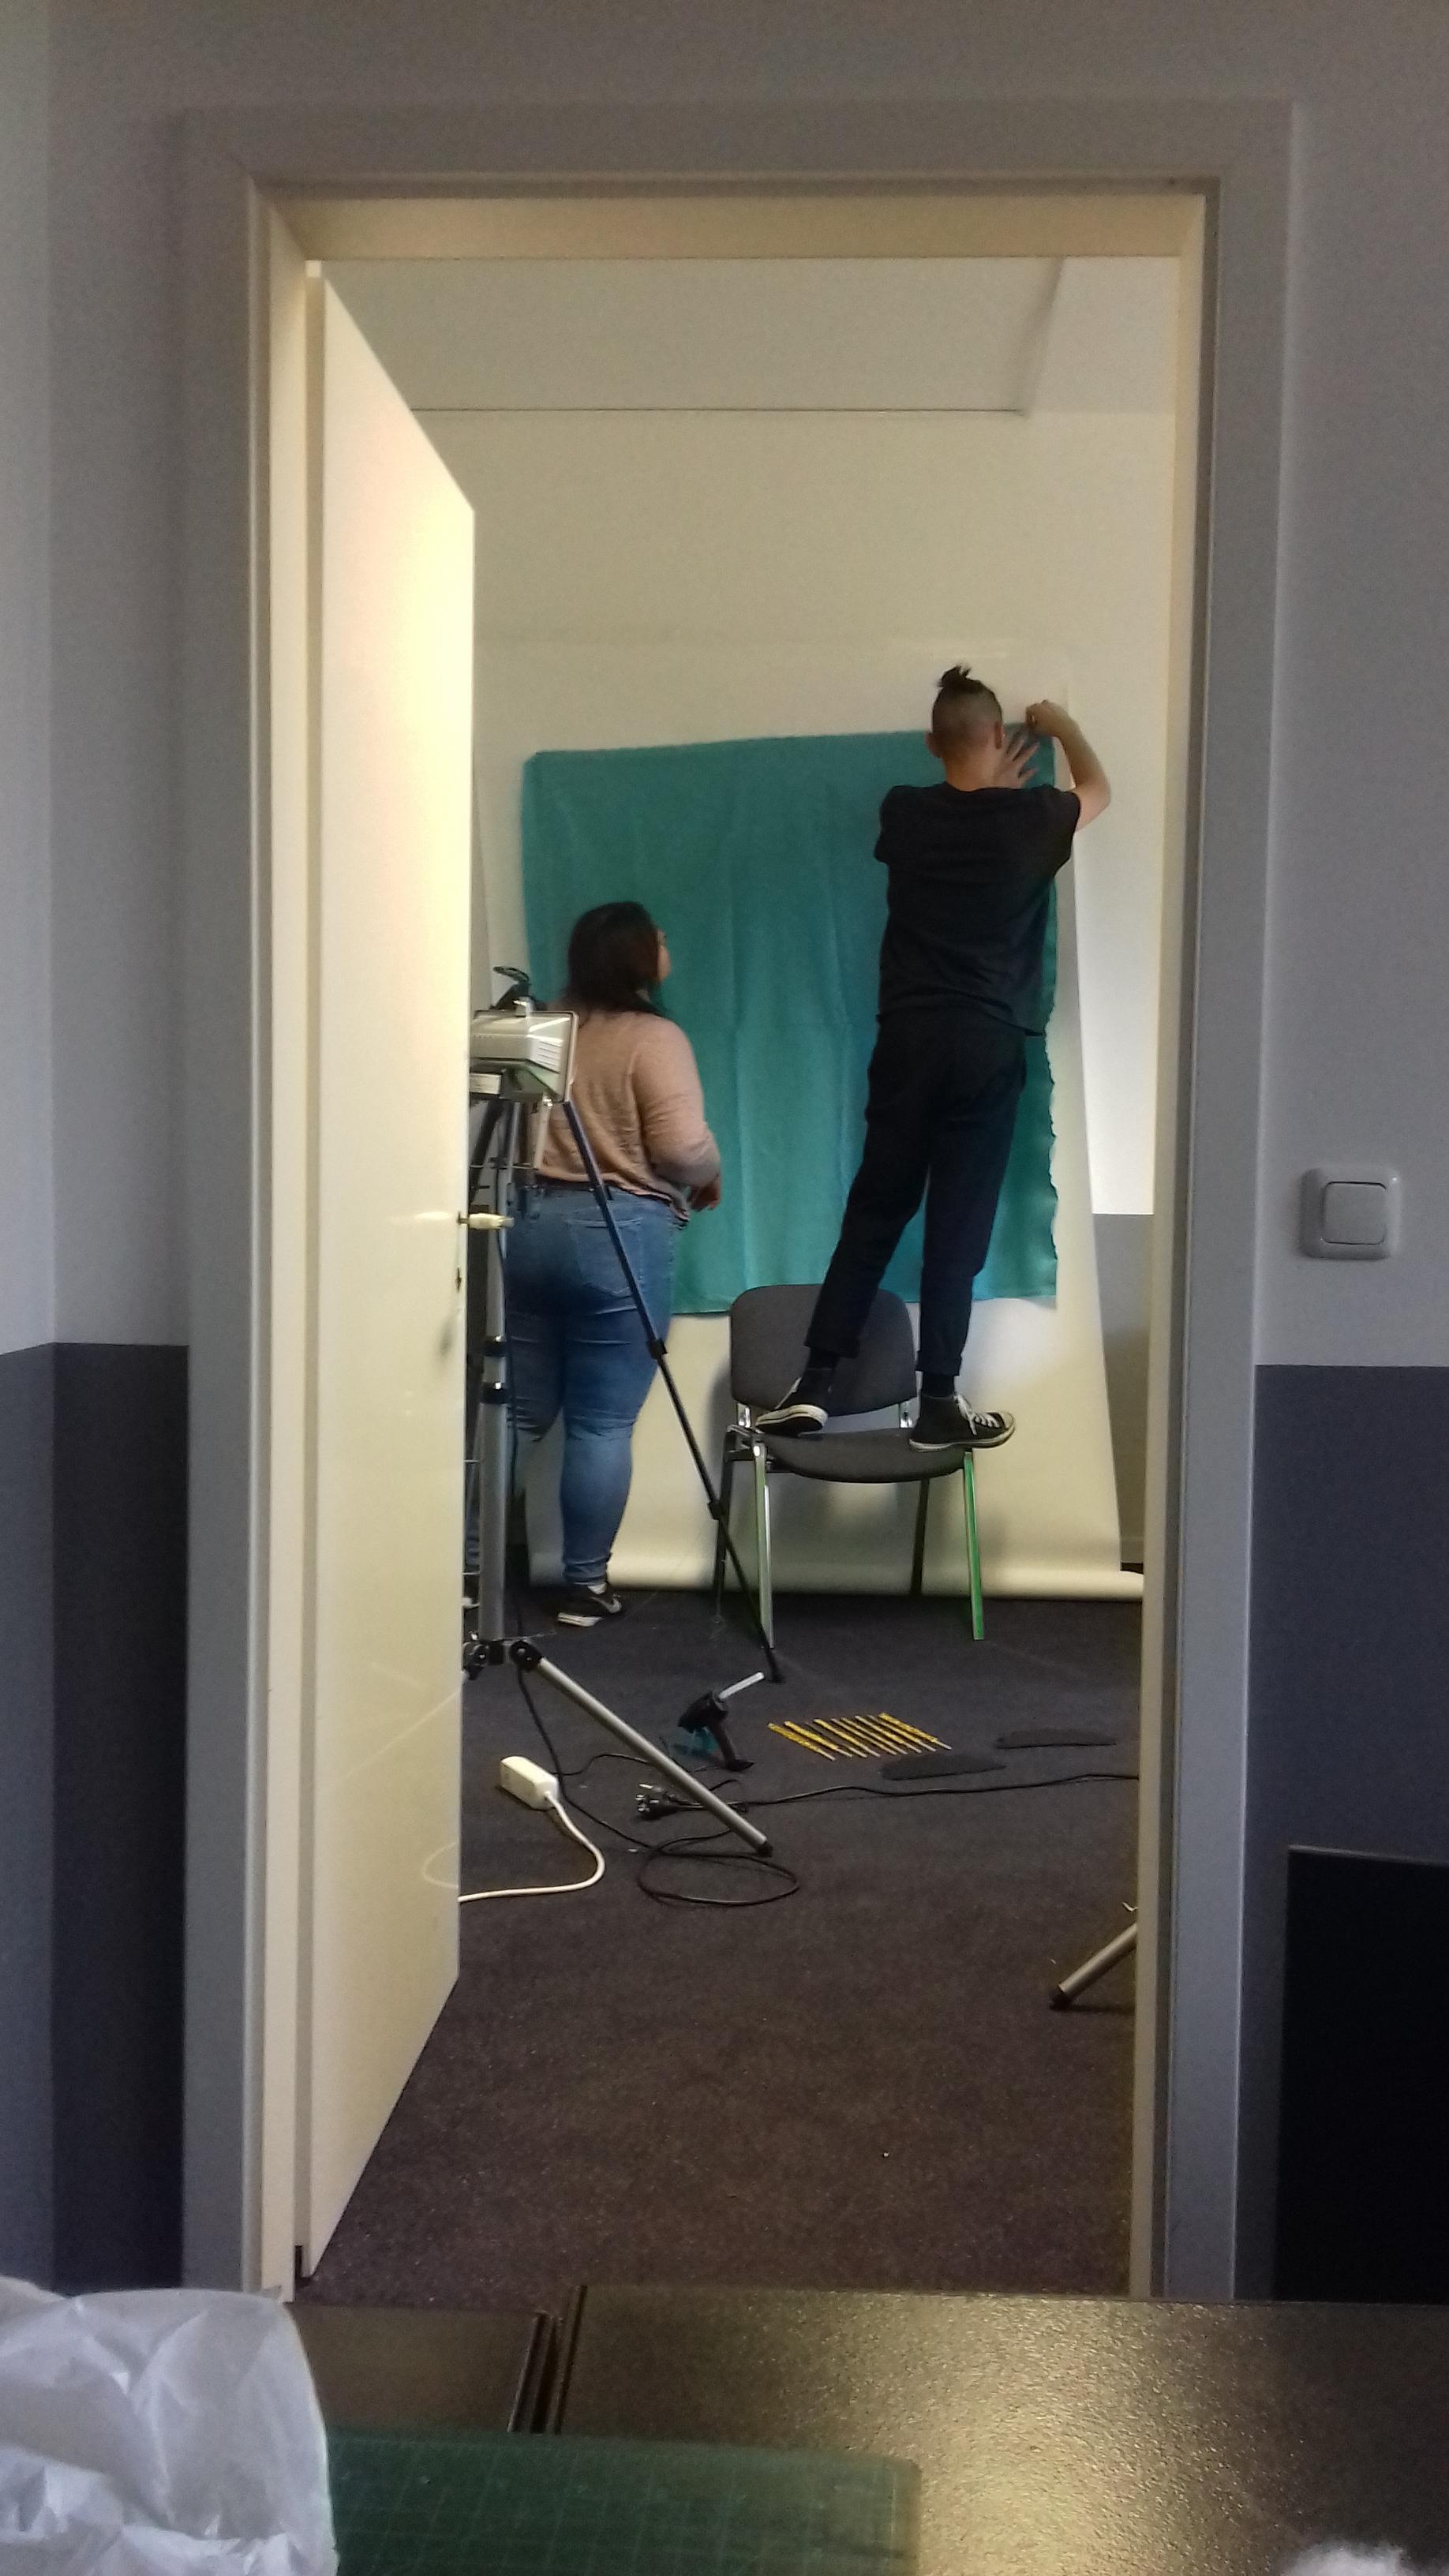 Ricardo's photoshoot / setup